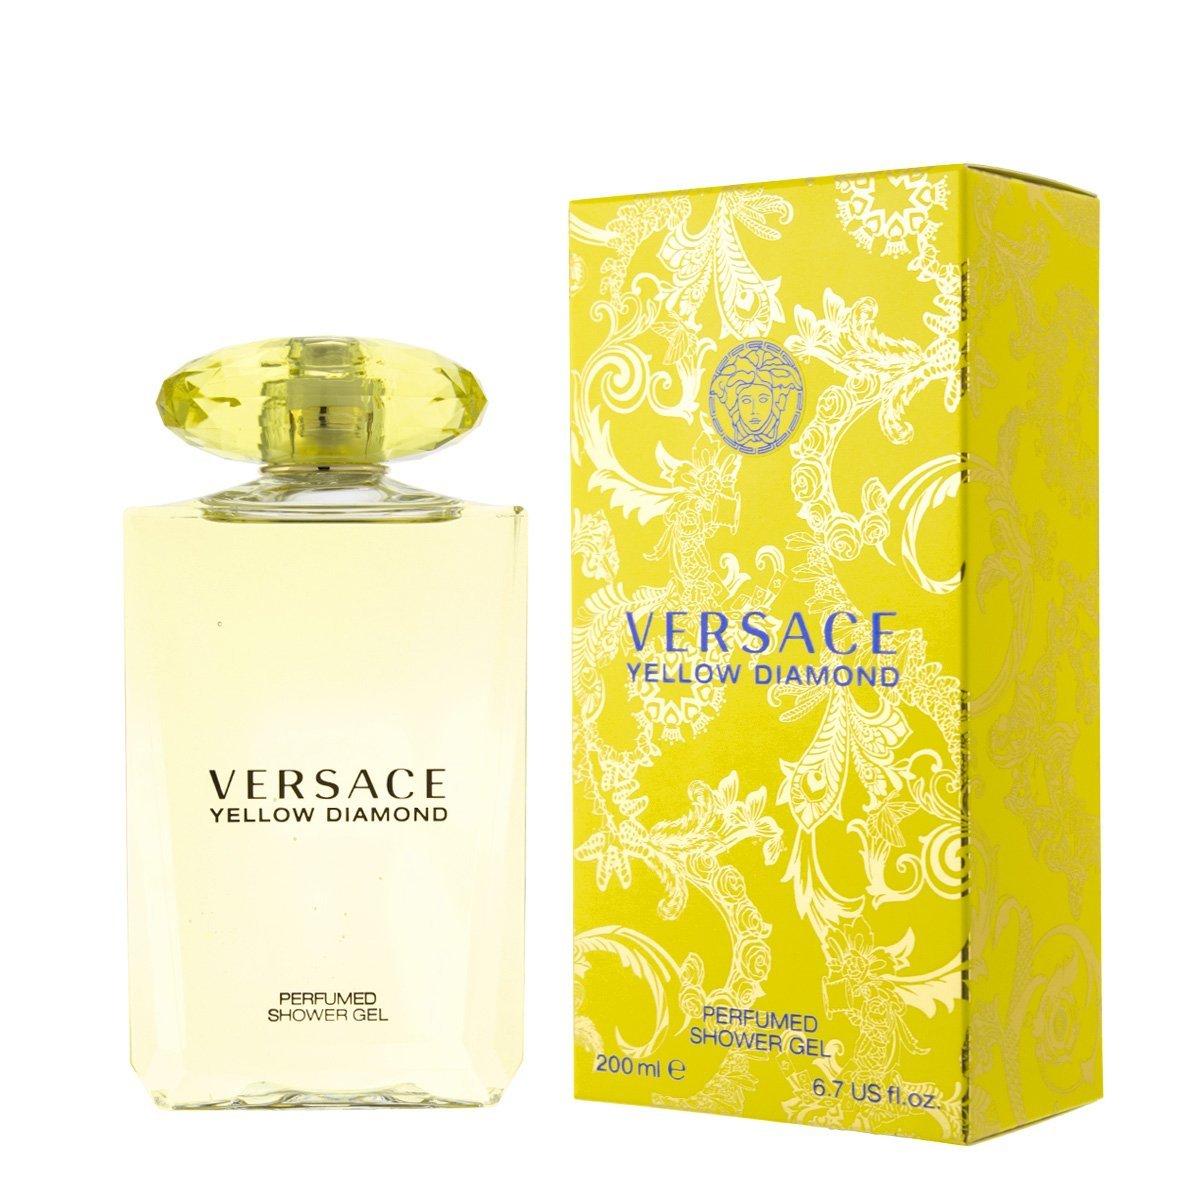 Versace Yellow Diamond, 200ml, Sprchový gel